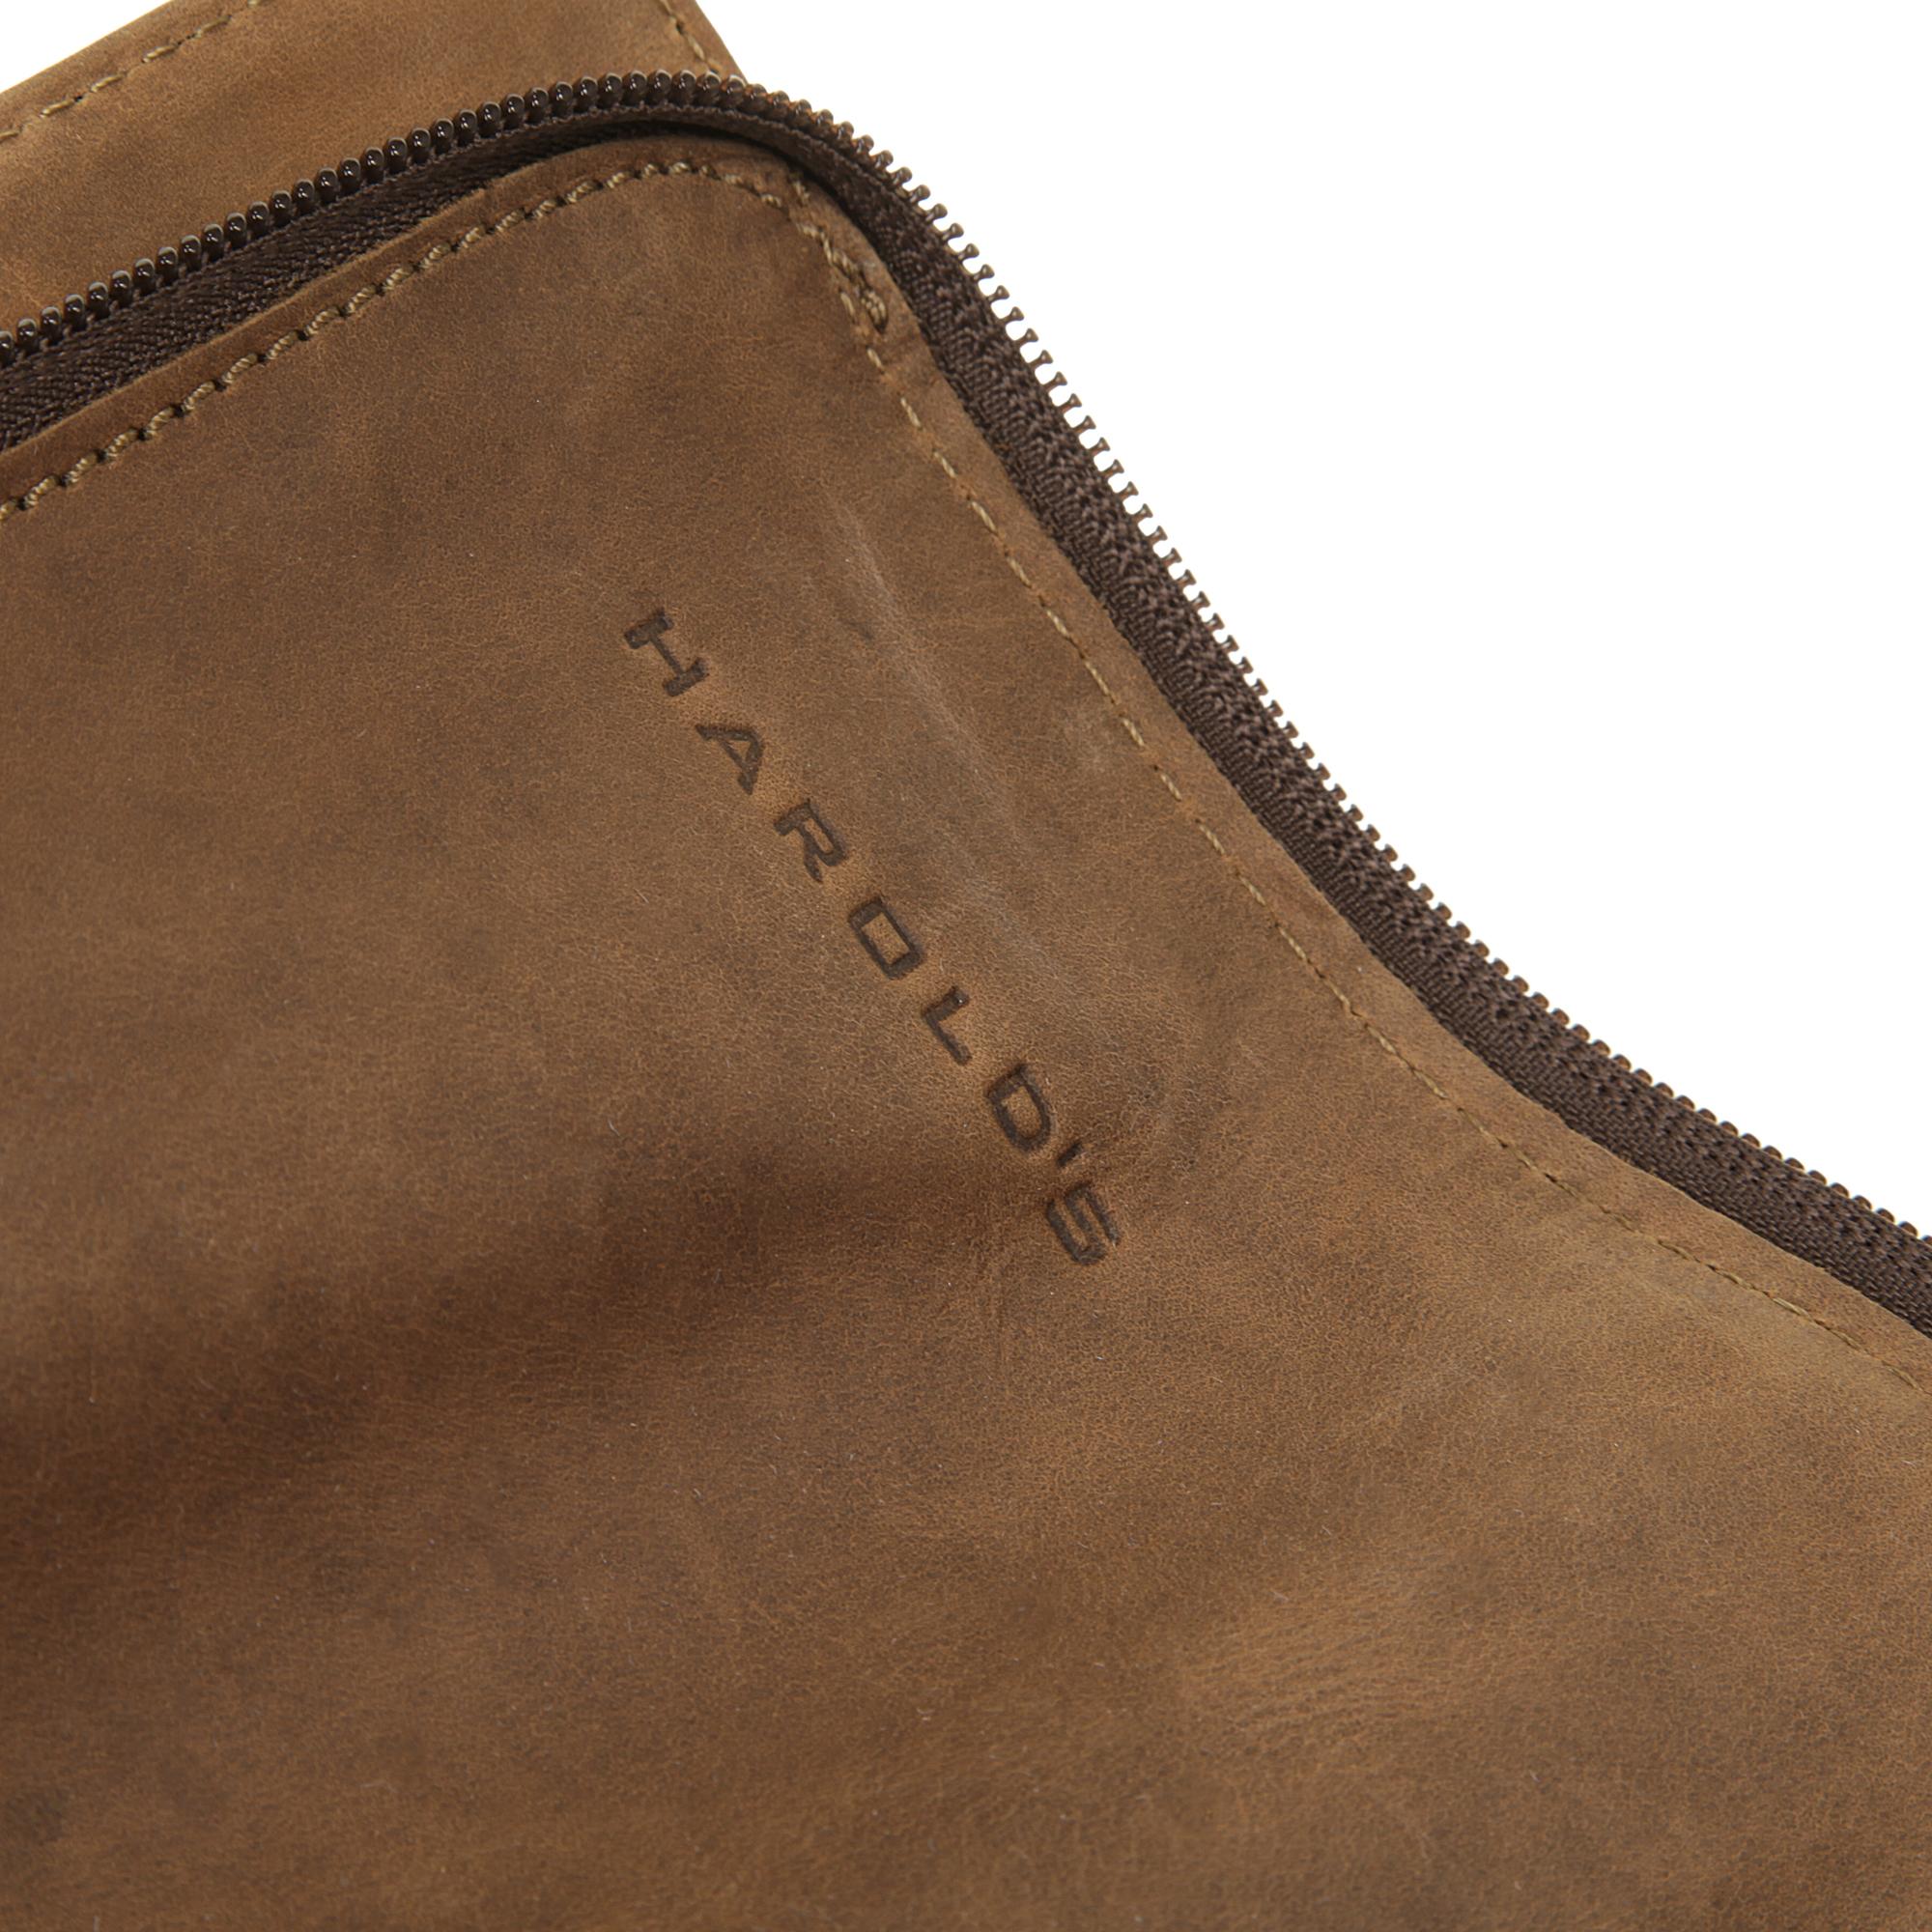 Harold's Notebooktasche 2IN1 in cognac günstig kaufen